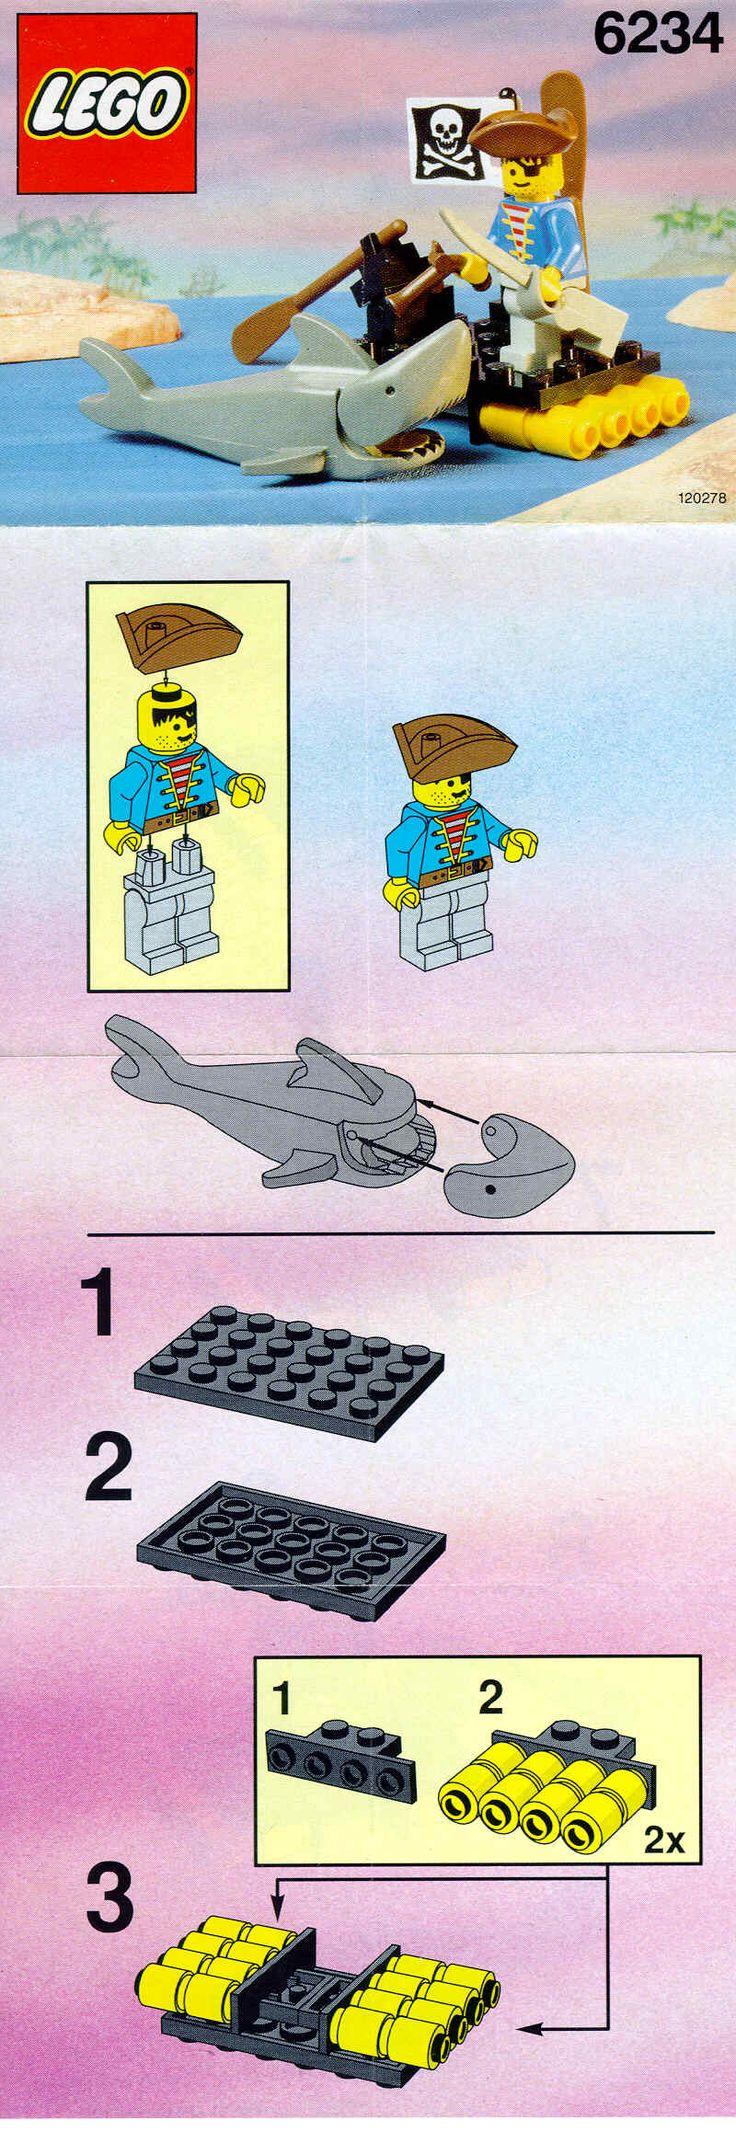 Lego Pirates: 6234 Renegade's Raft (1991)